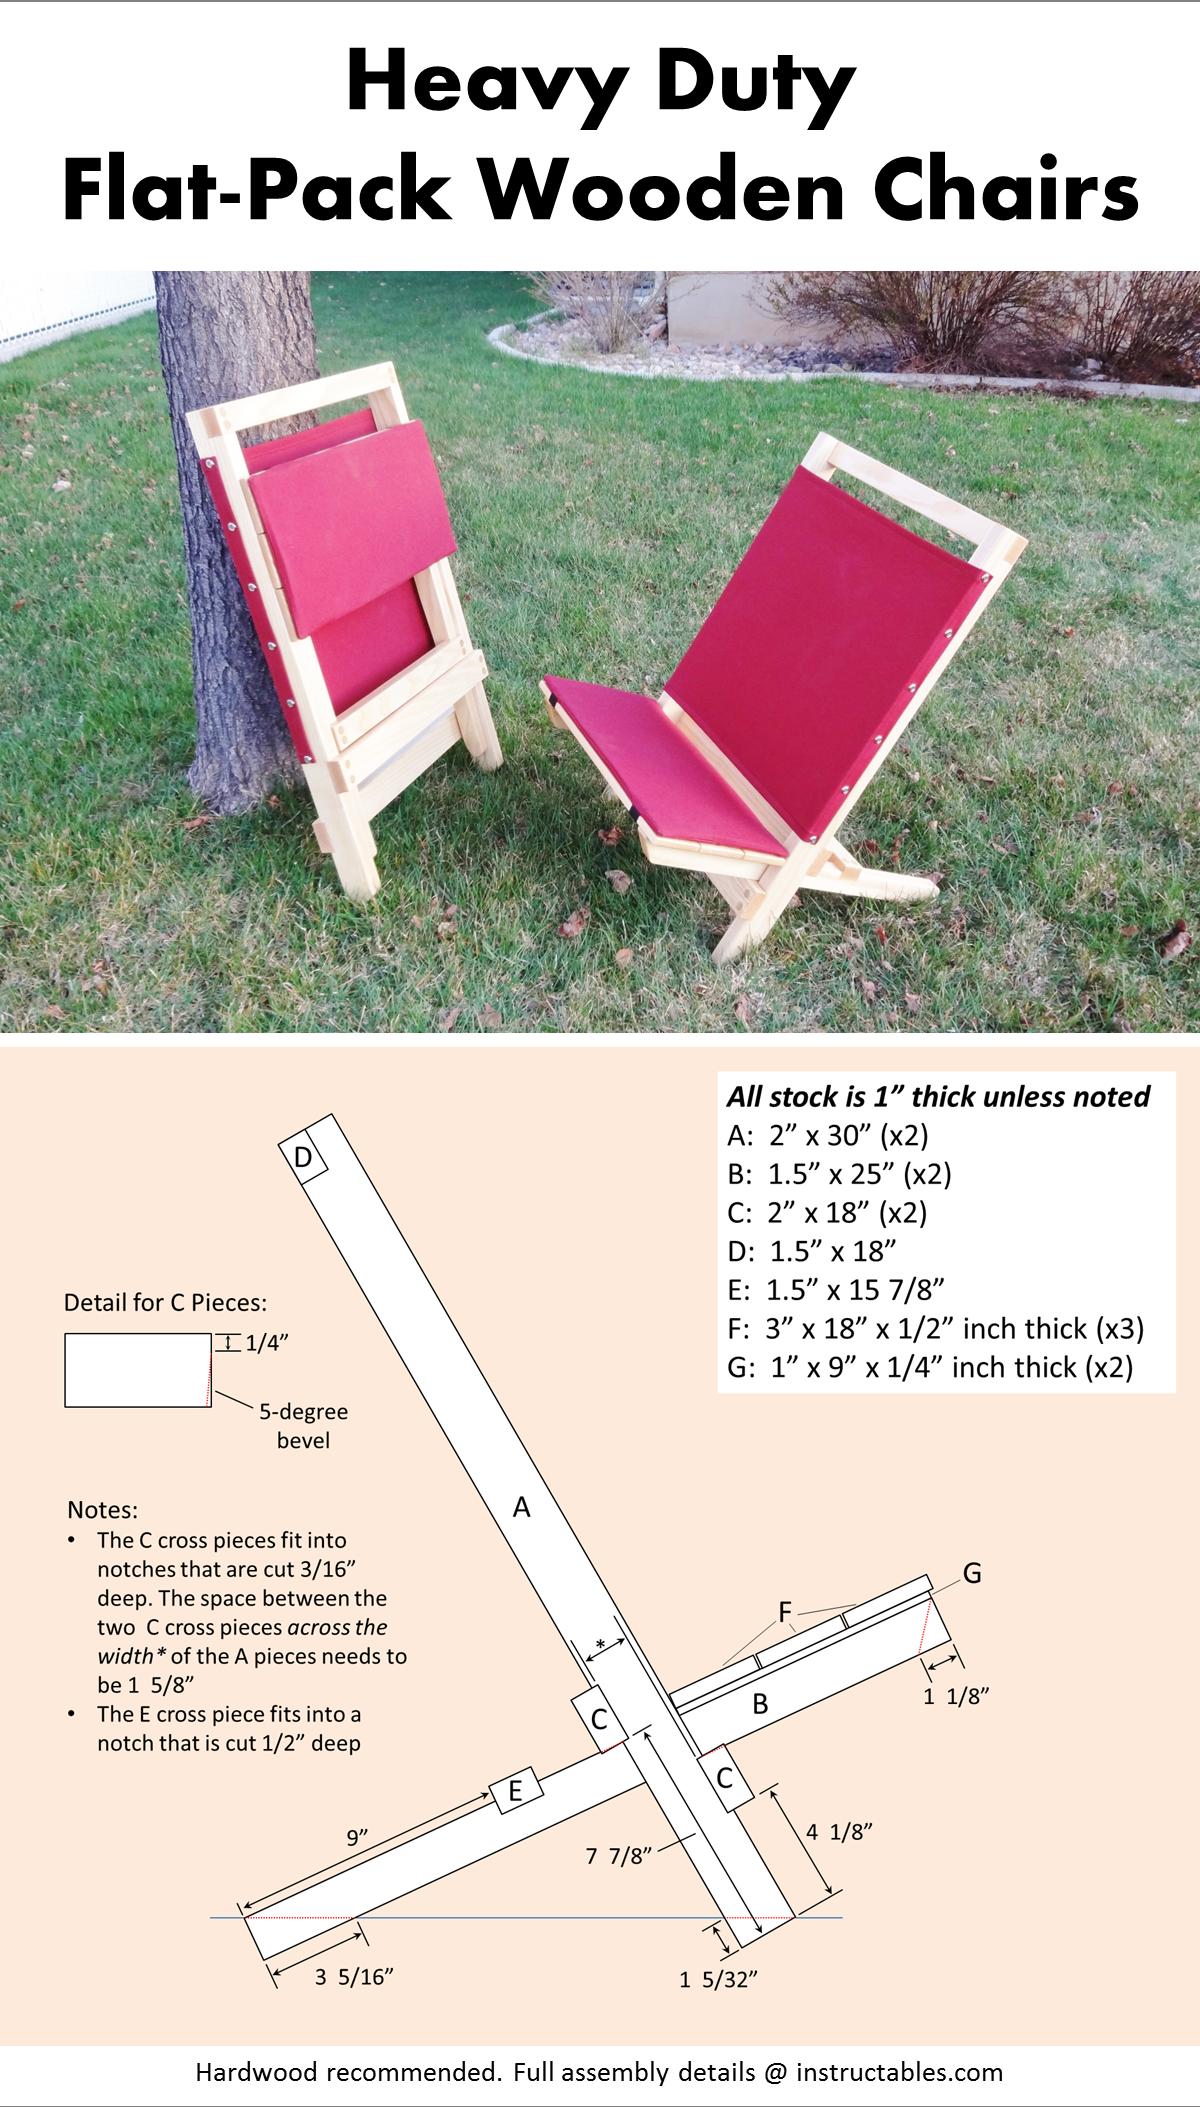 Flat Pack Wooden Chairs Wooden Beach Chairs Wooden Chair Beach Chairs Diy